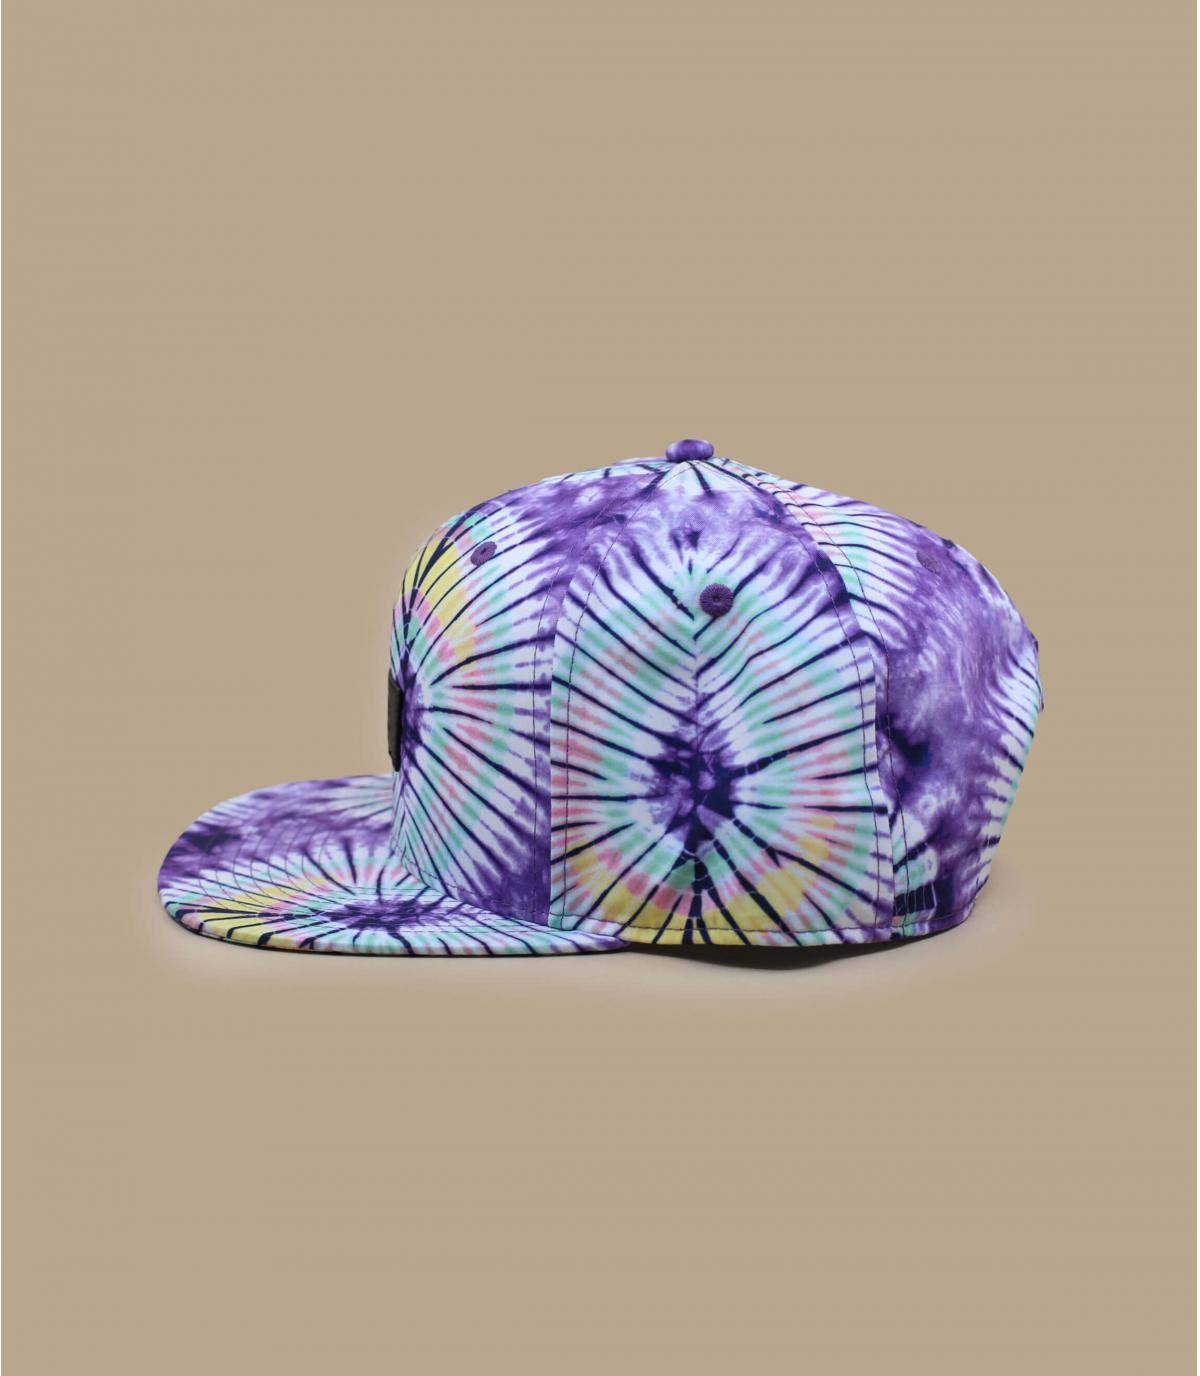 Details Snapback Laces 54 New Age Tie Dye purple - afbeeling 3